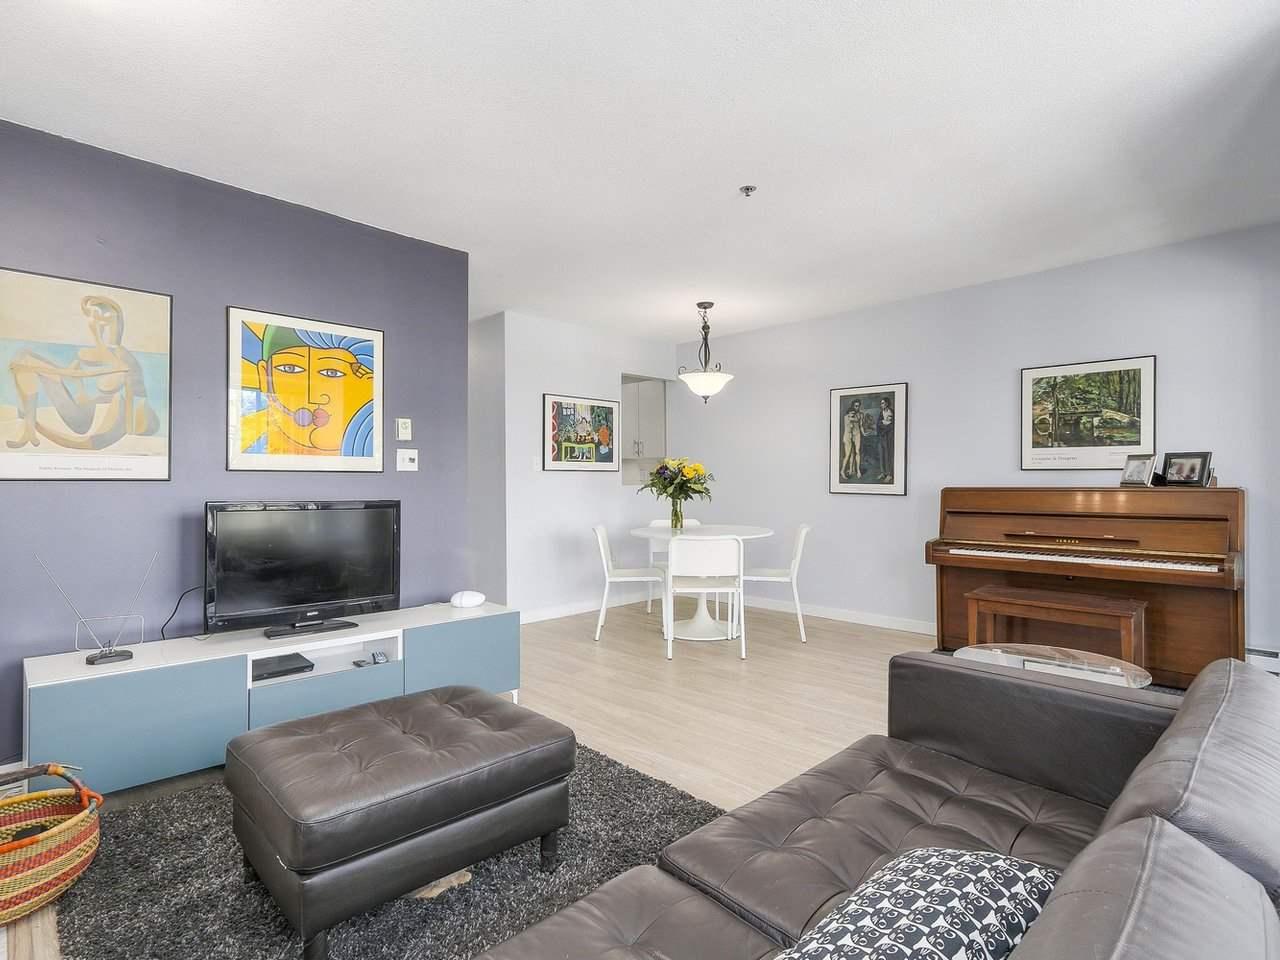 Condo Apartment at 301 120 GARDEN DRIVE, Unit 301, Vancouver East, British Columbia. Image 4